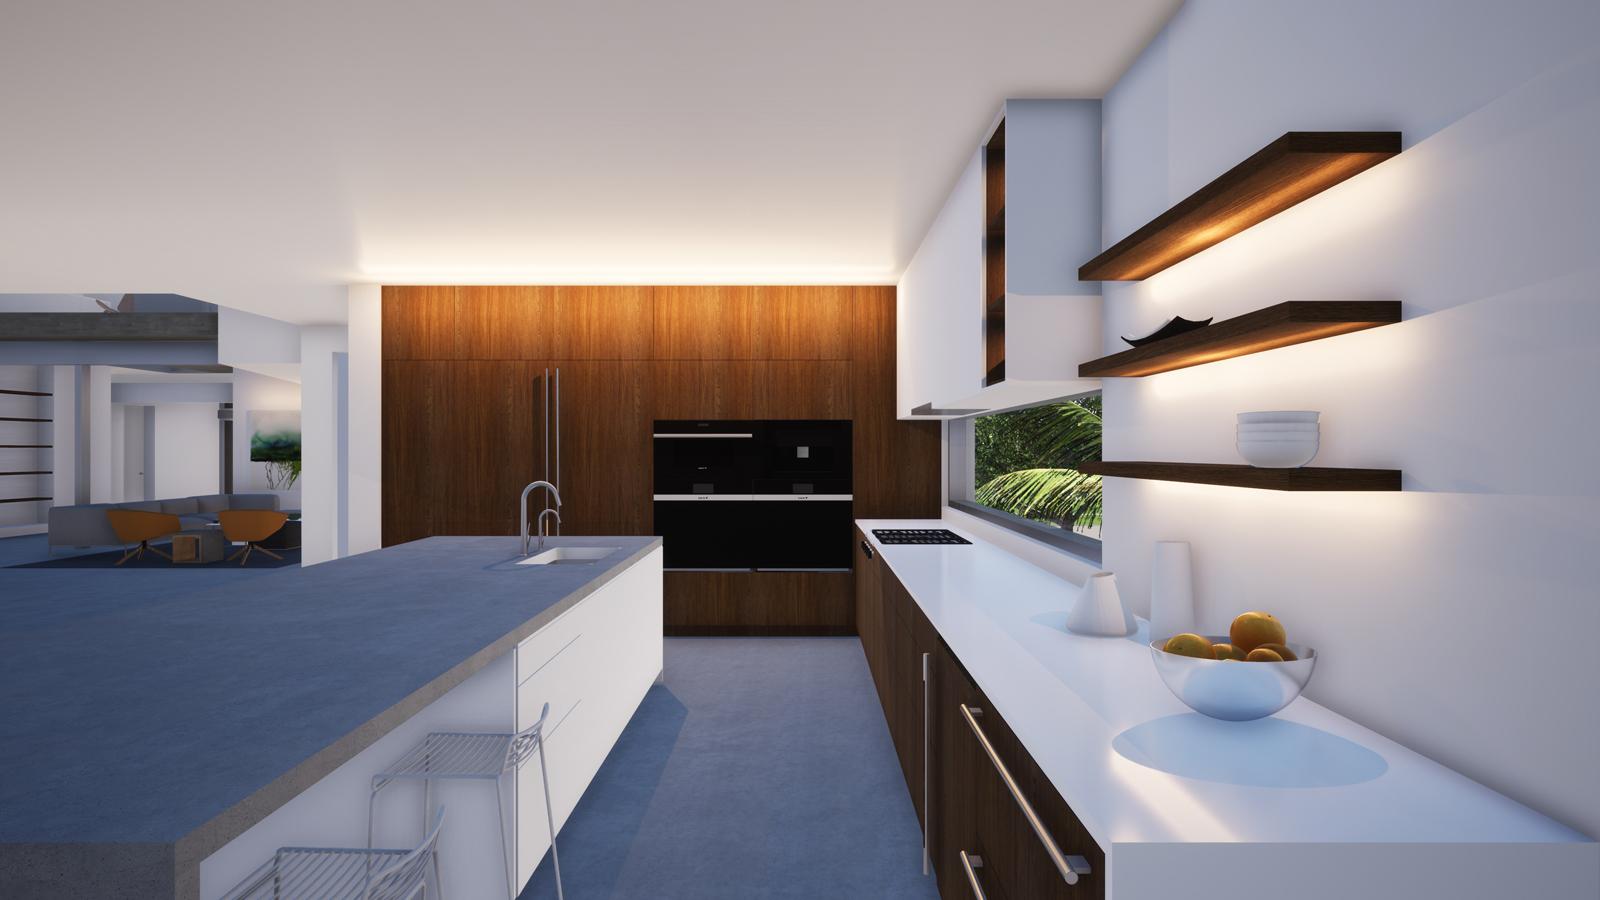 Palimpsest_House_Kitchen_03.jpg